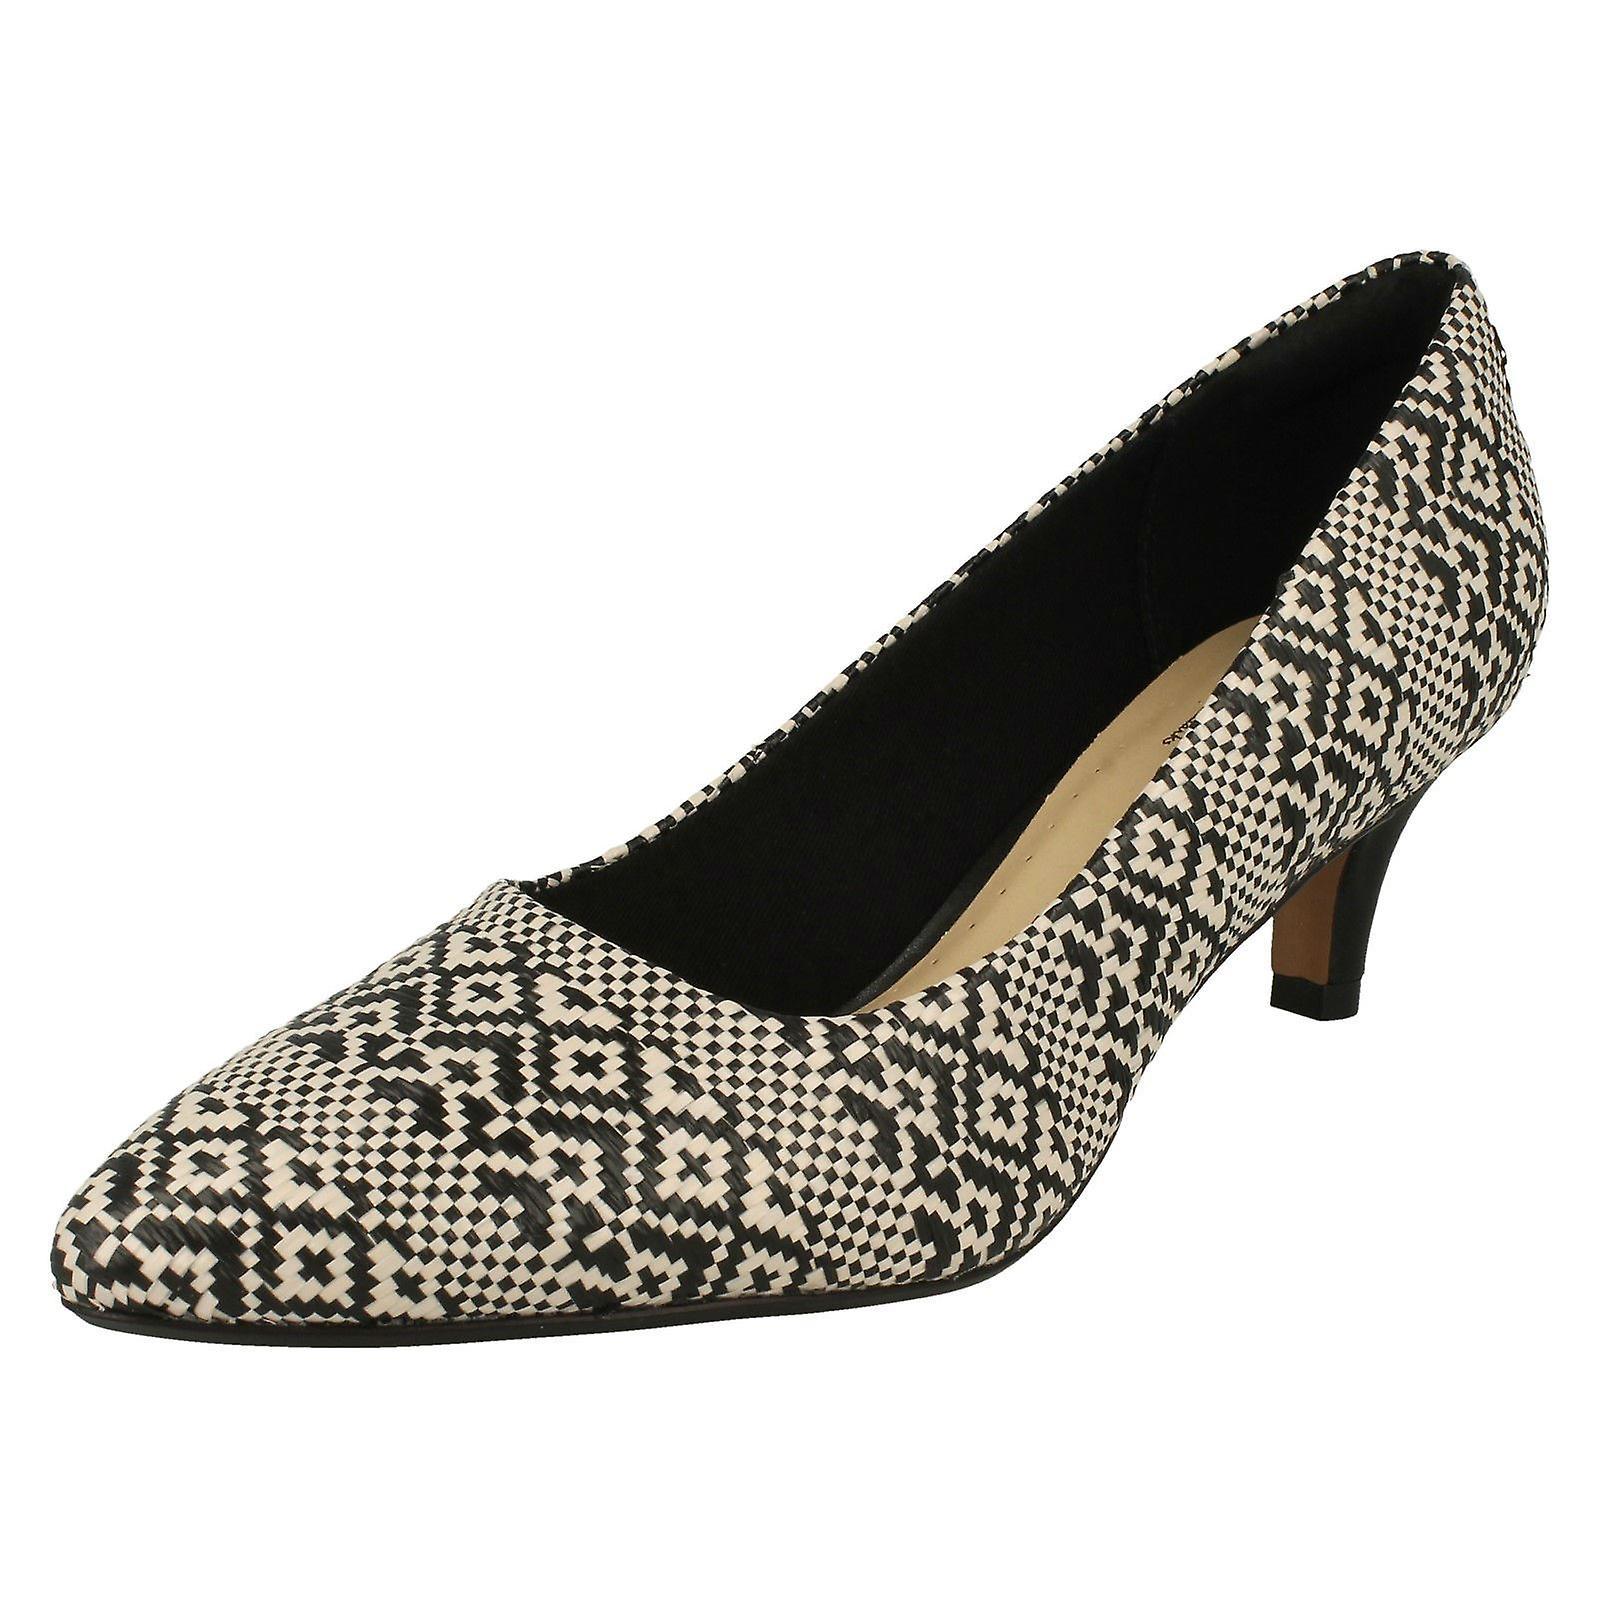 Ladies Clarks Pointed Toe Court Shoes Linvale Jerica qY6bM